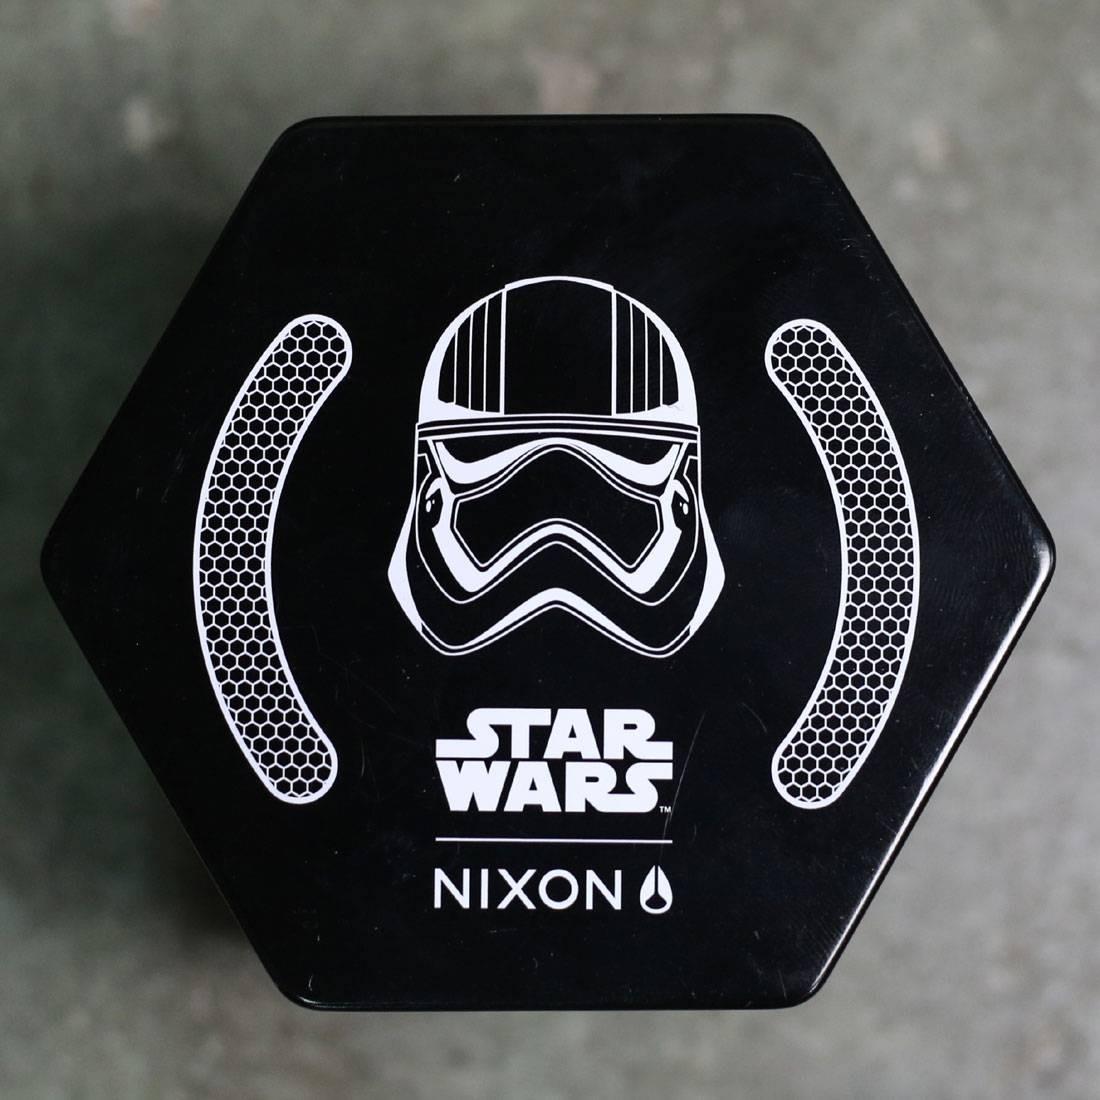 e046e44cf80 Nixon x Star Wars Sentry SS Watch - Captain Phasma (silver)